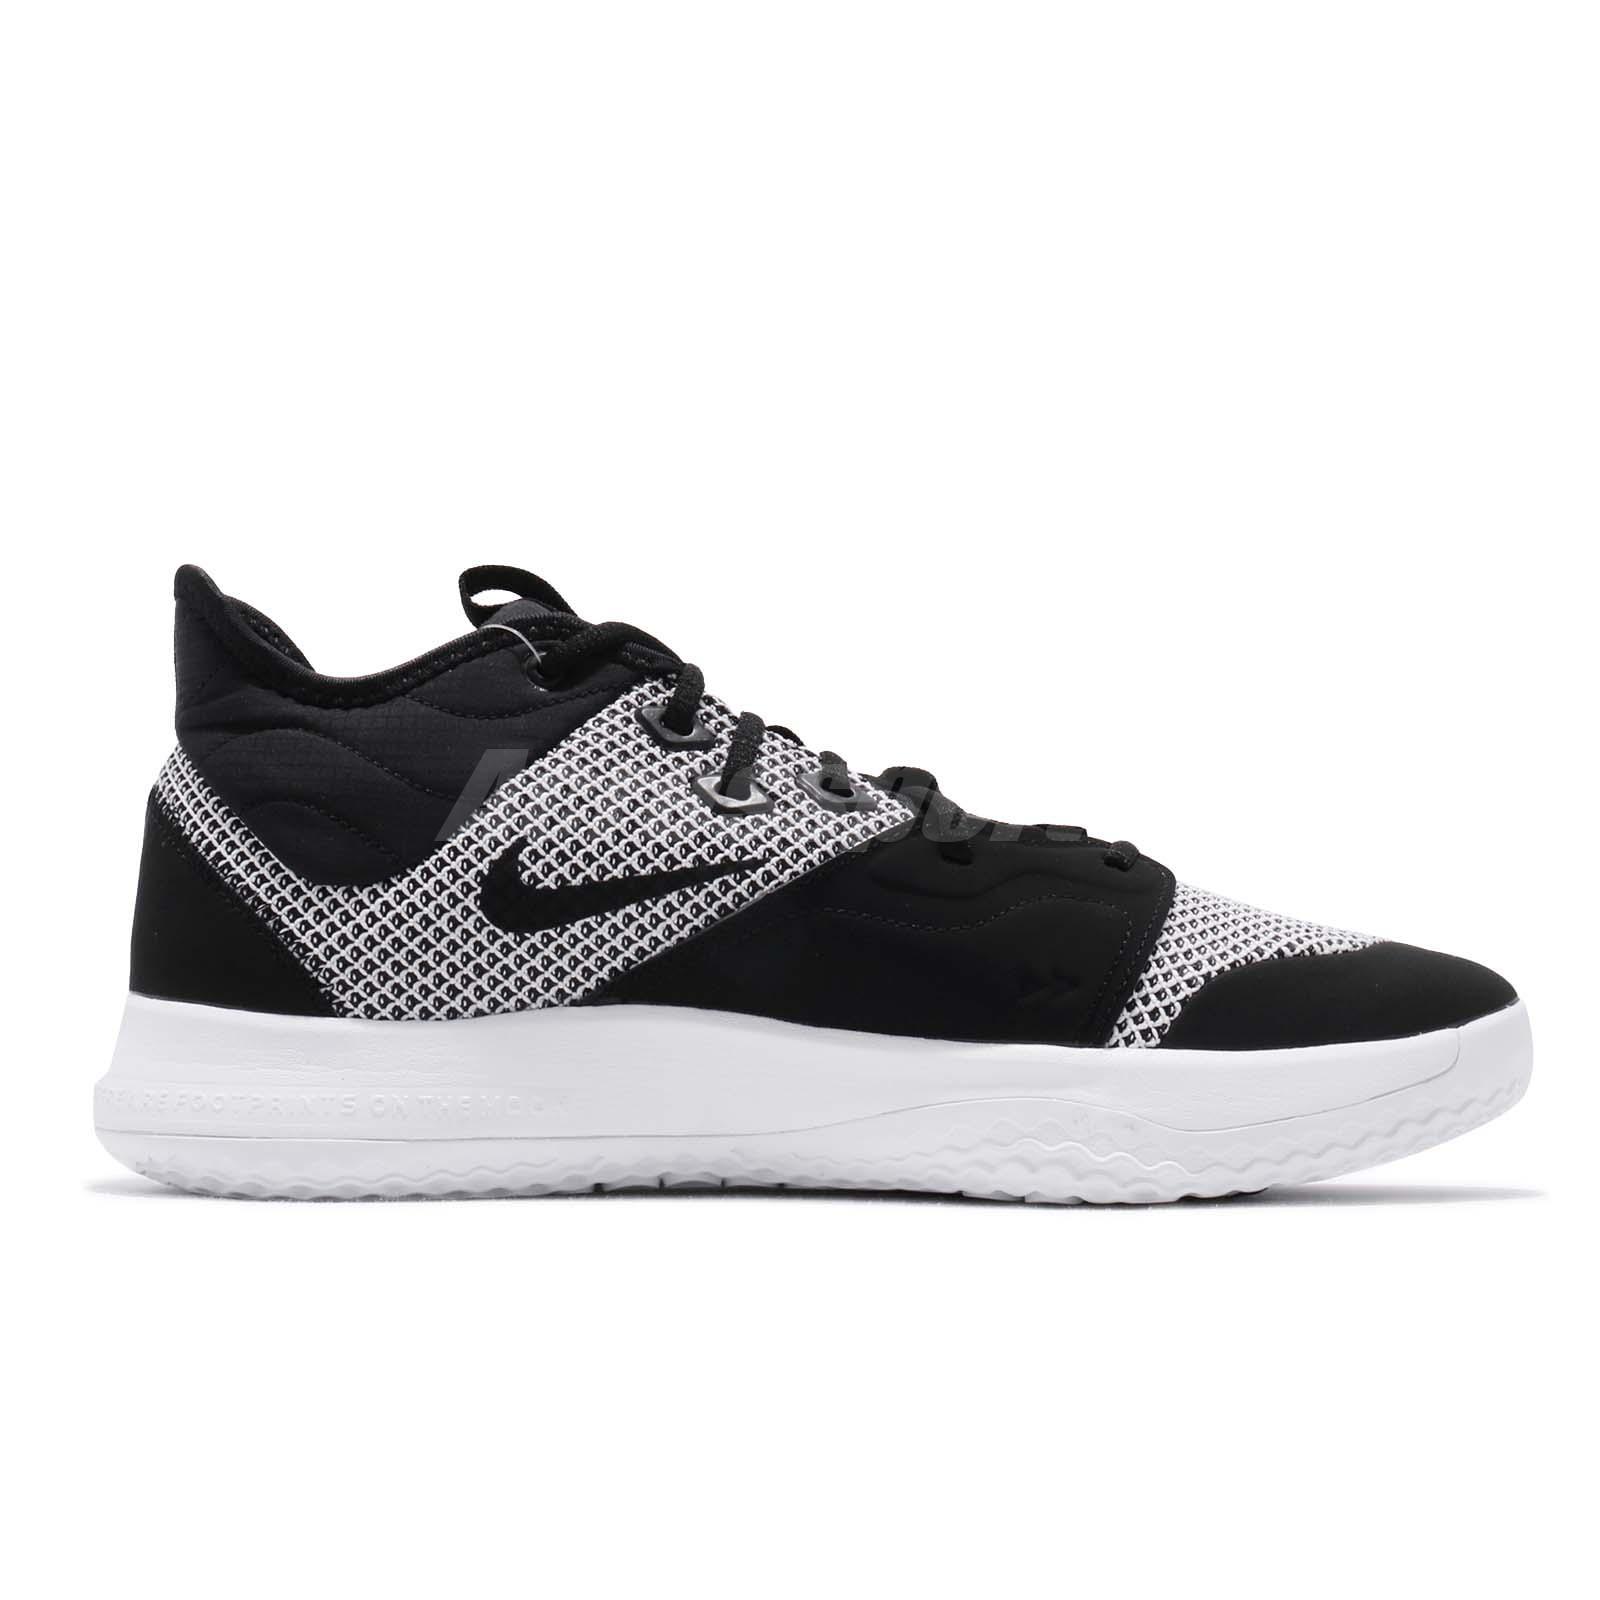 4b8fc00e89b Nike PG 3 EP Paul George Black White Mens Basketball Shoes Sneakers ...